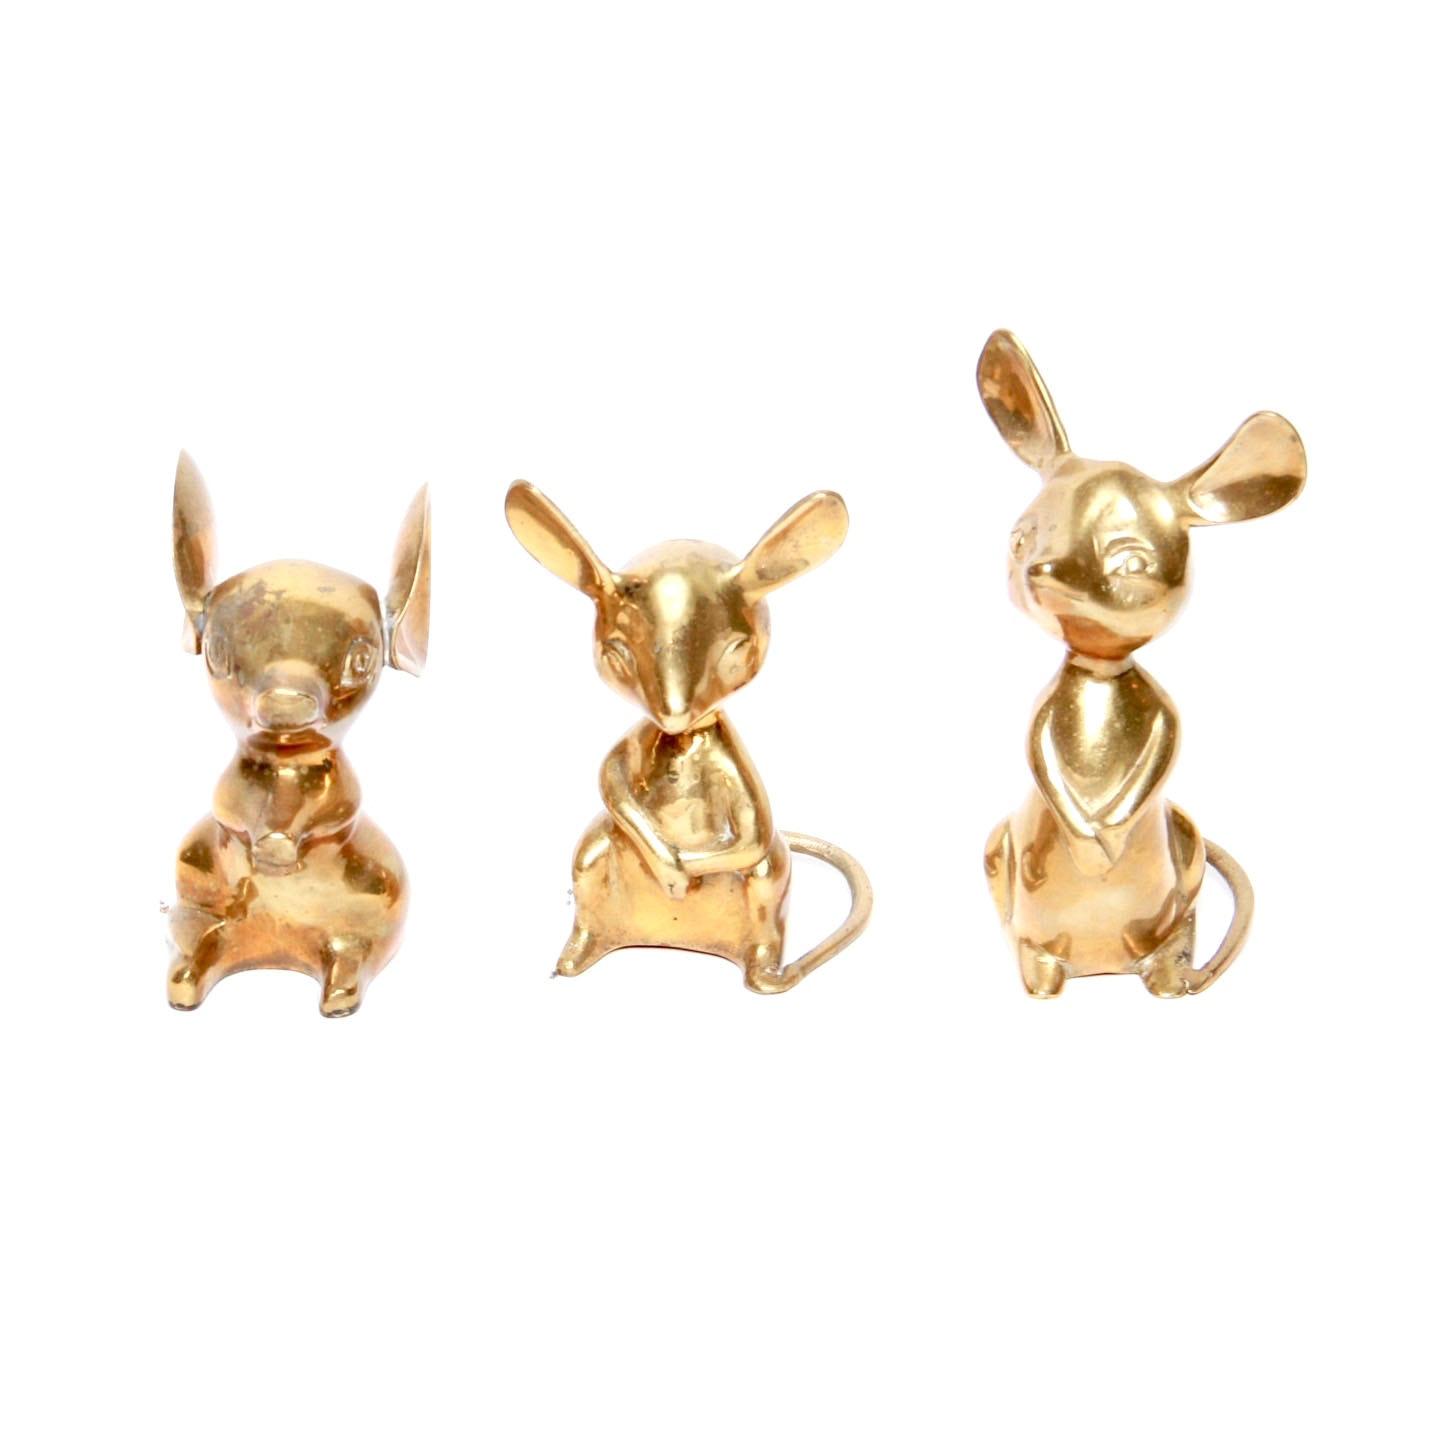 Brass Mice Figurines